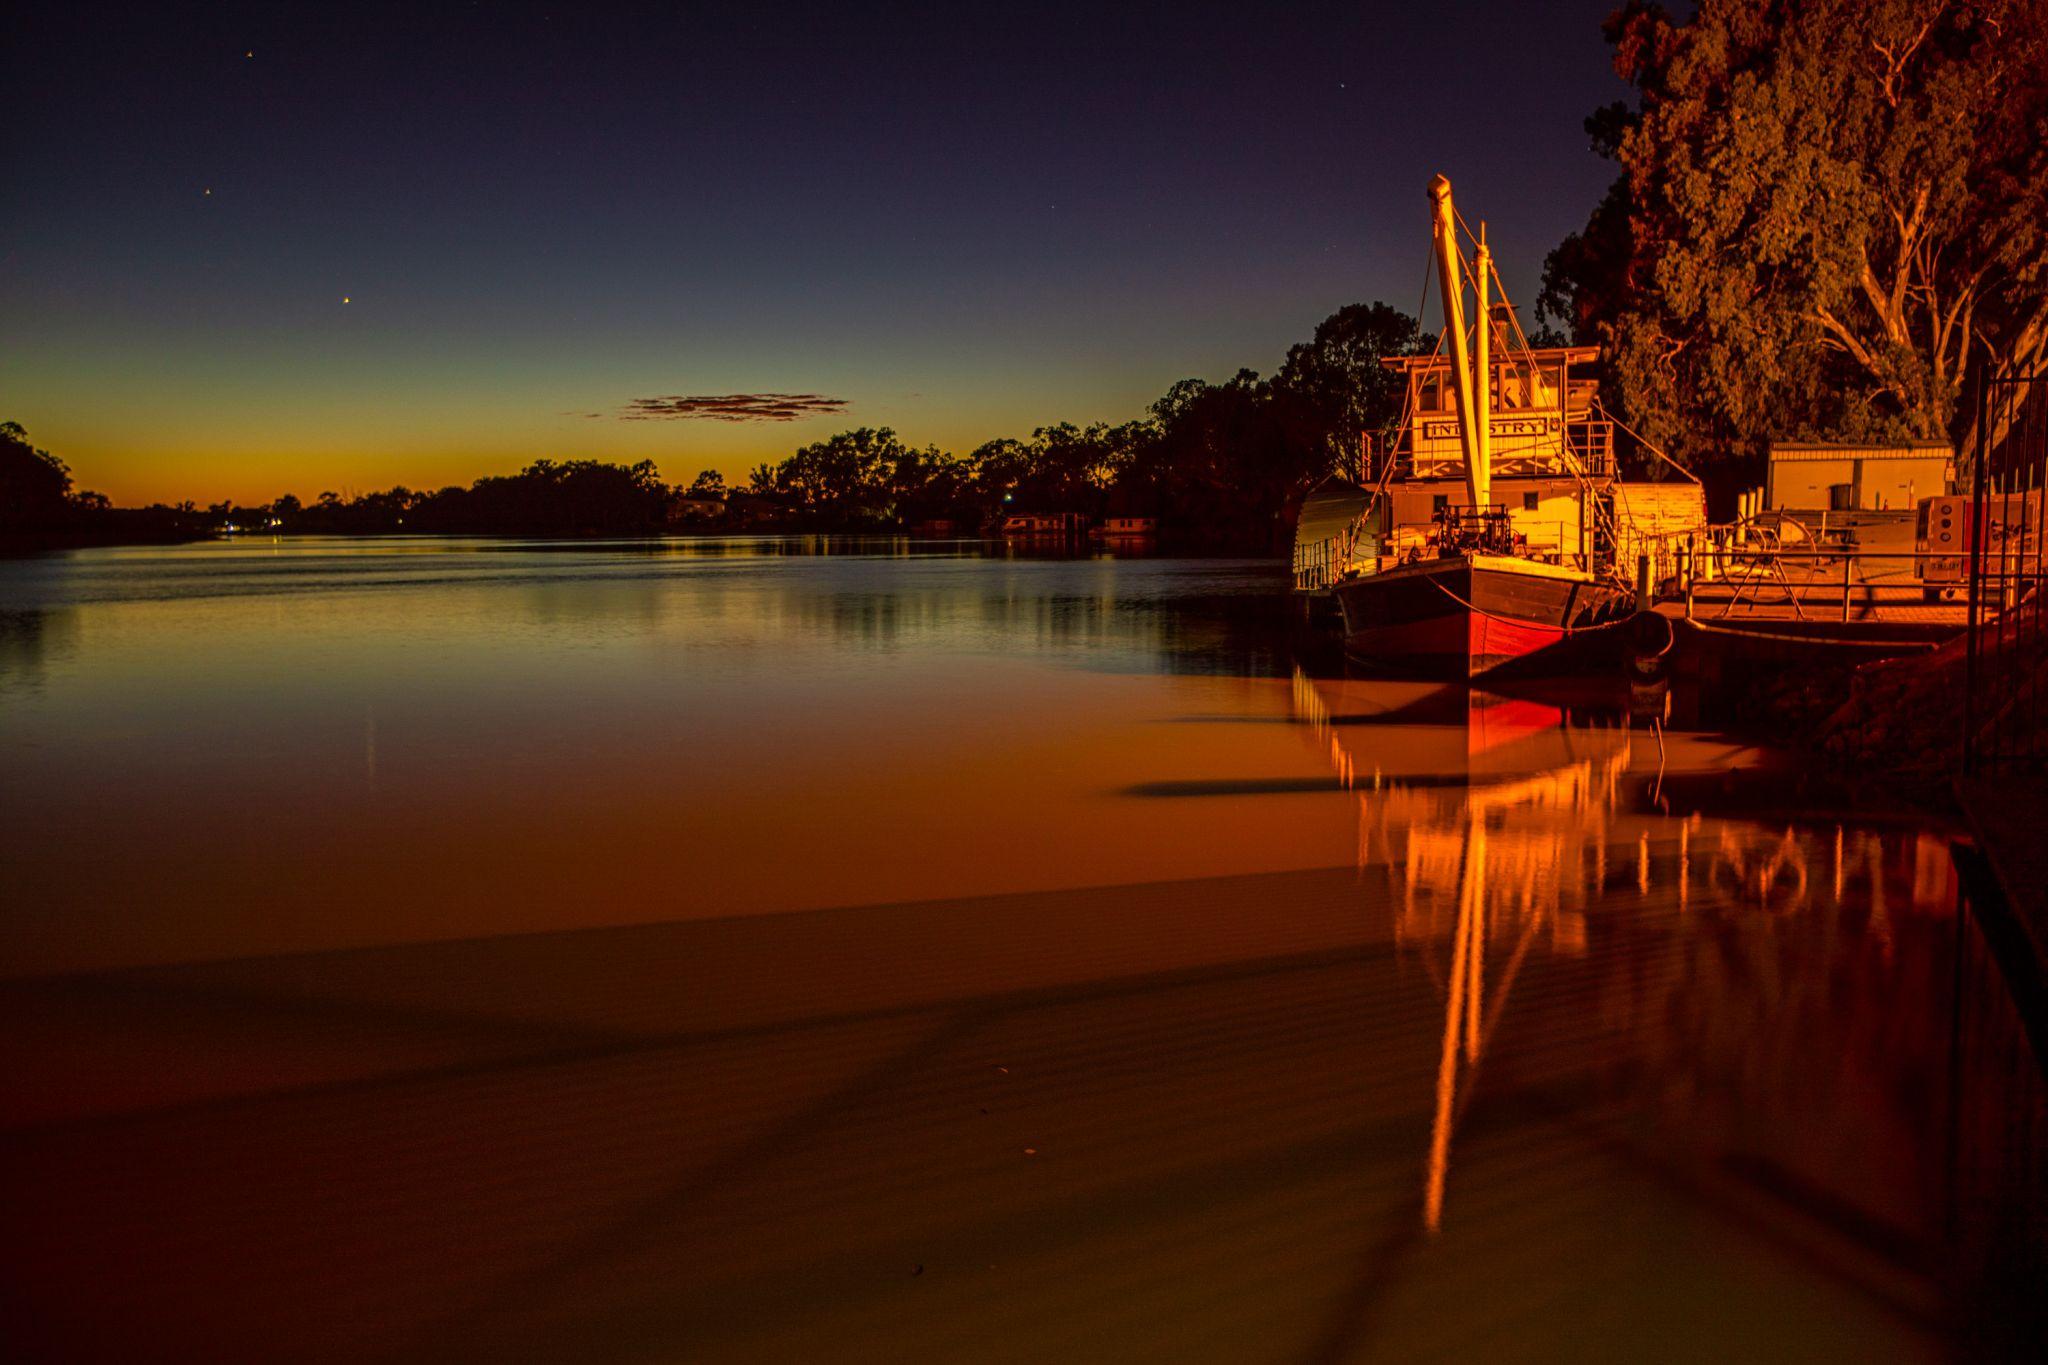 PS Industry sunrise Renmark South Australia, Australia